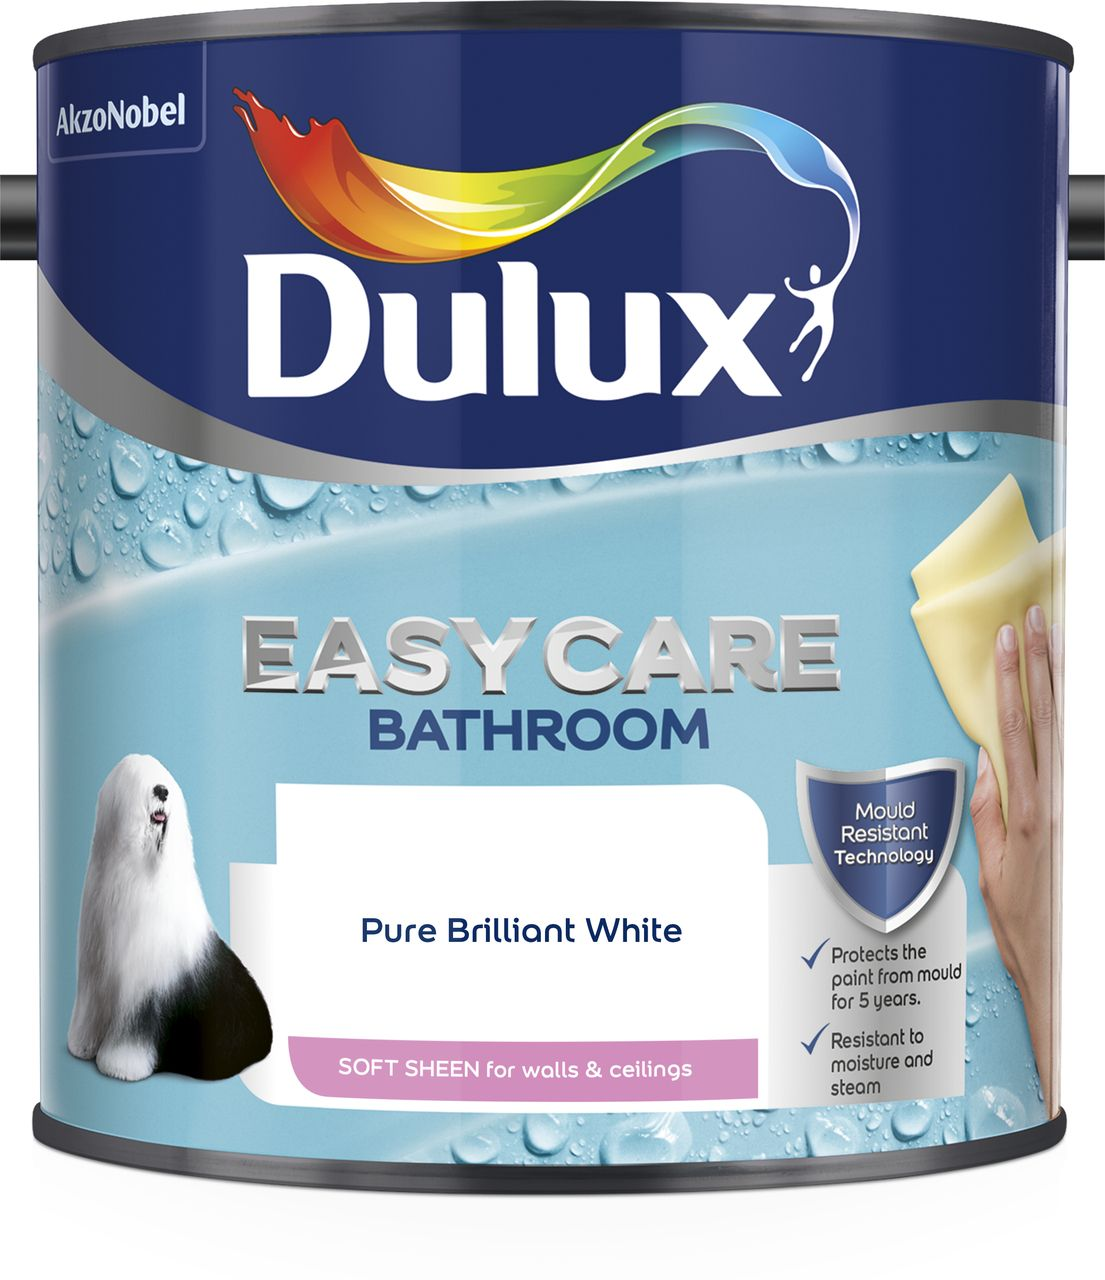 Wondrous Dulux Easycare Pure Brilliant White Soft Sheen Emulsion Paint 2 5L Departments Diy At Bq Home Interior And Landscaping Spoatsignezvosmurscom